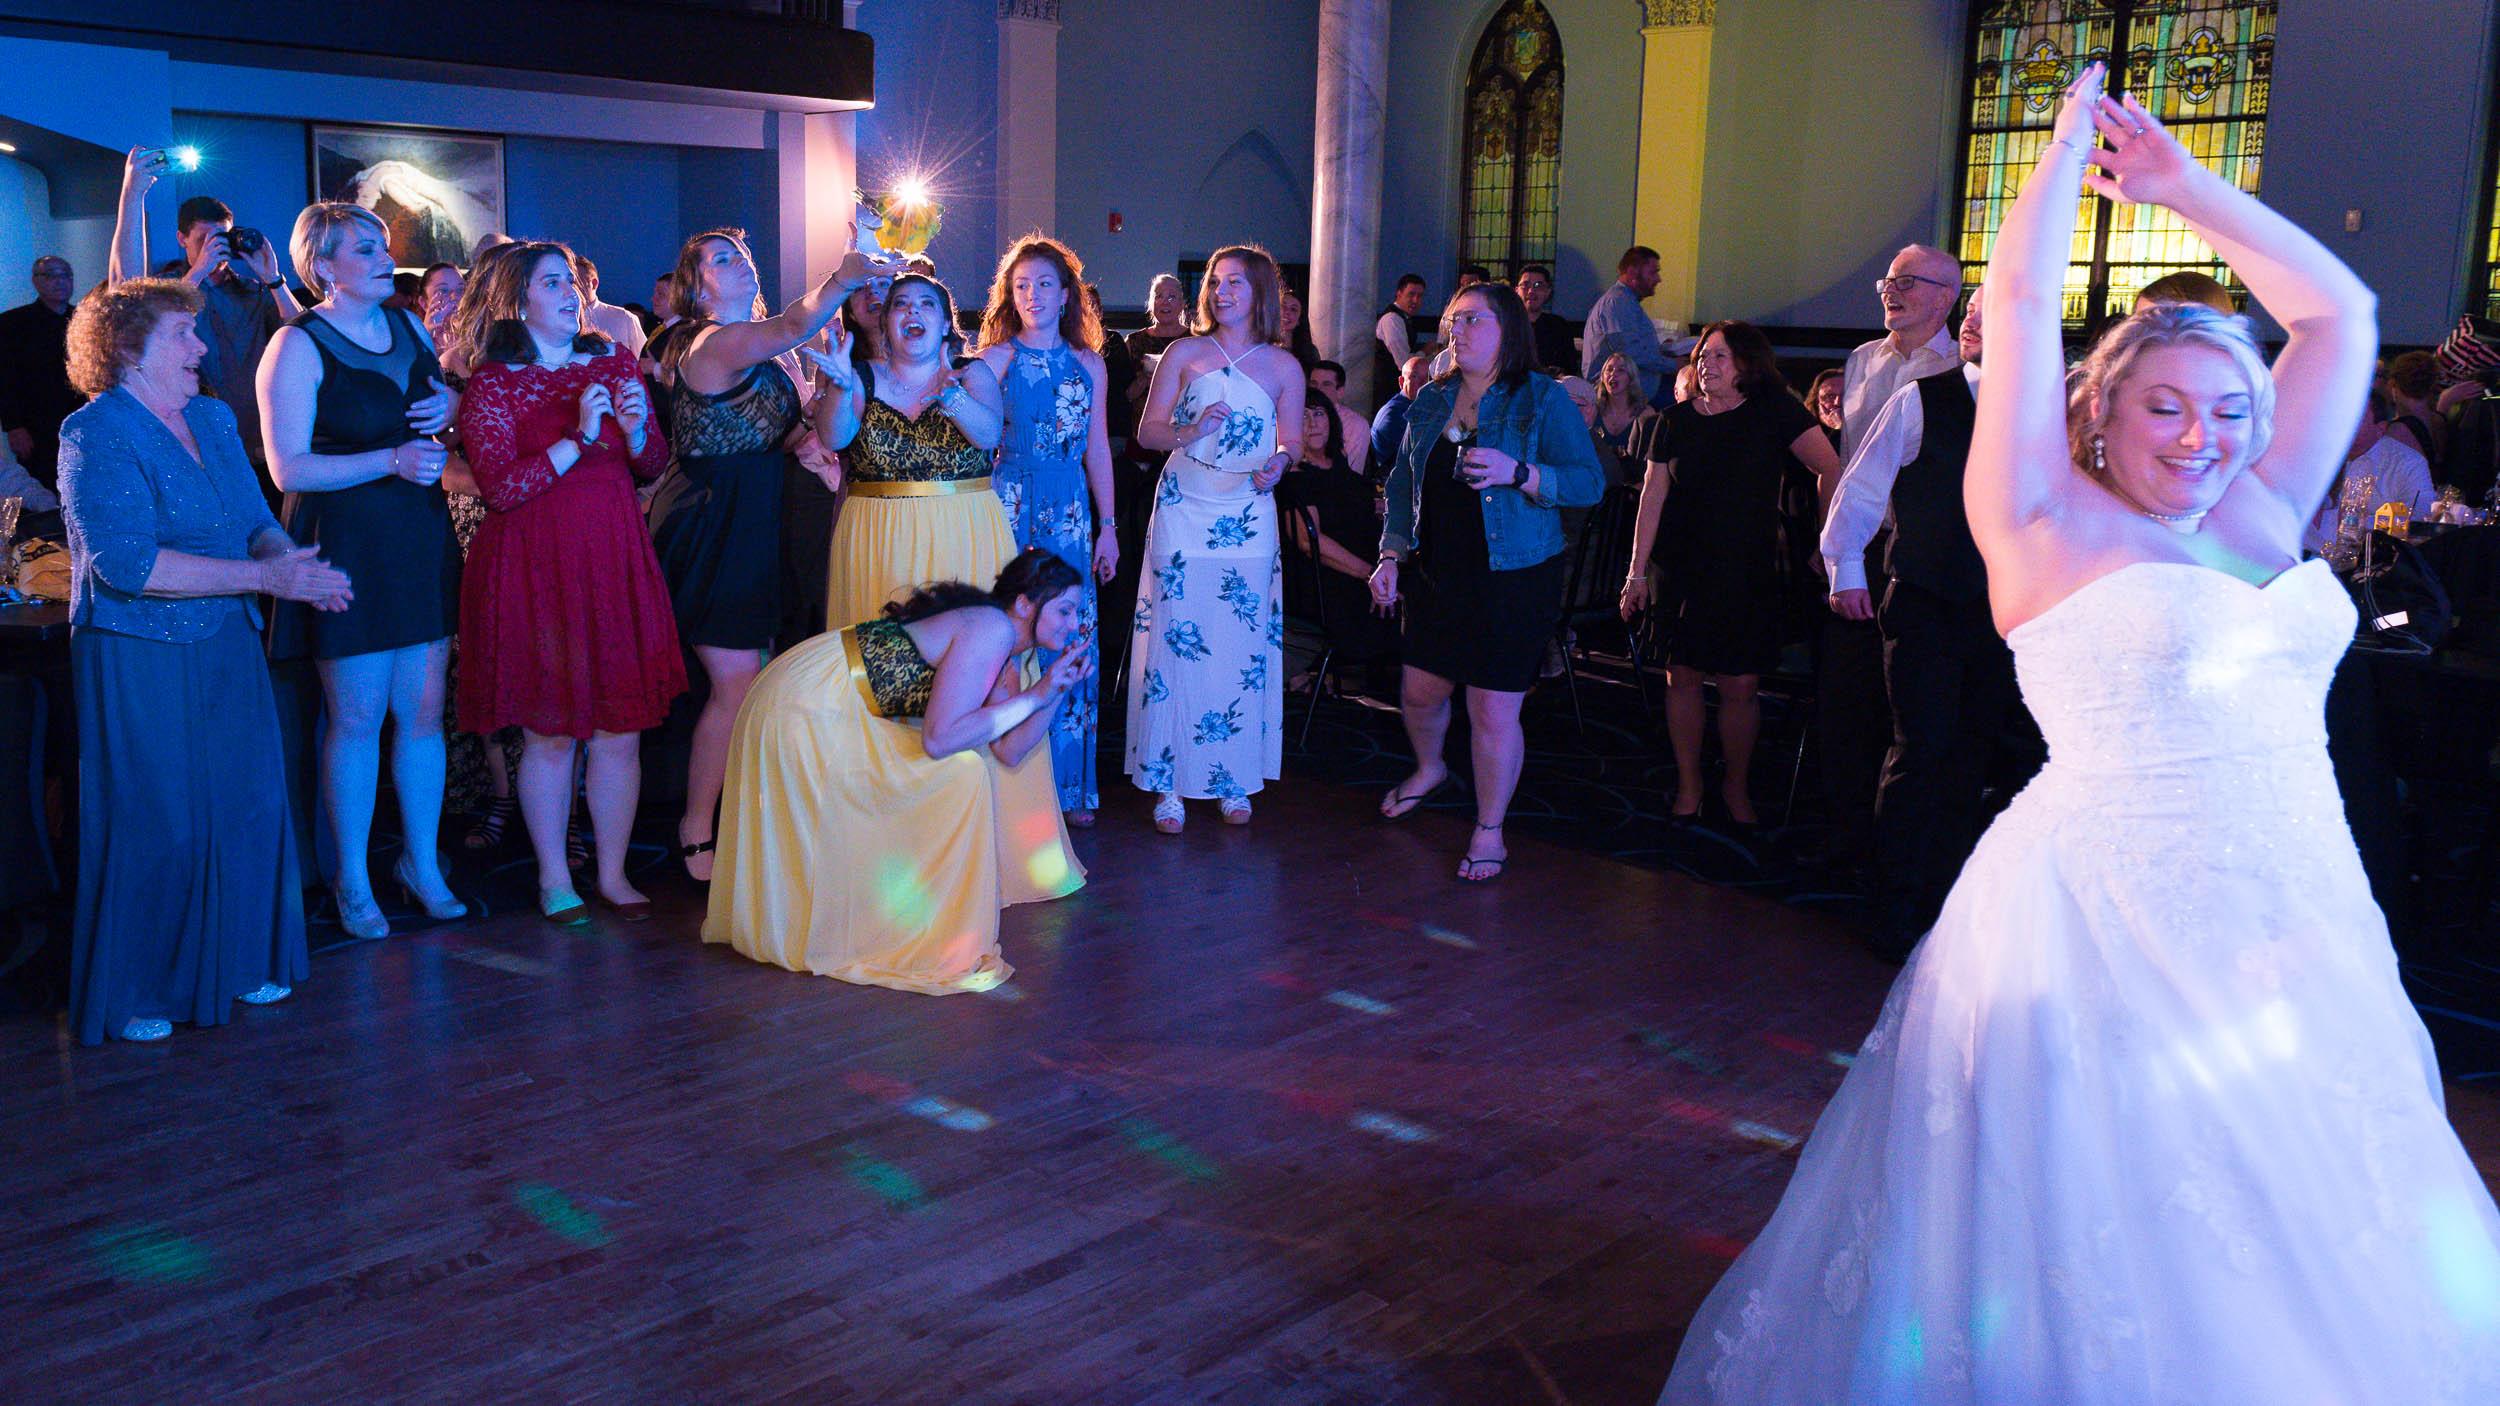 Wedding-Reception-Cefelos-Banquet-Event-Center-10.jpg